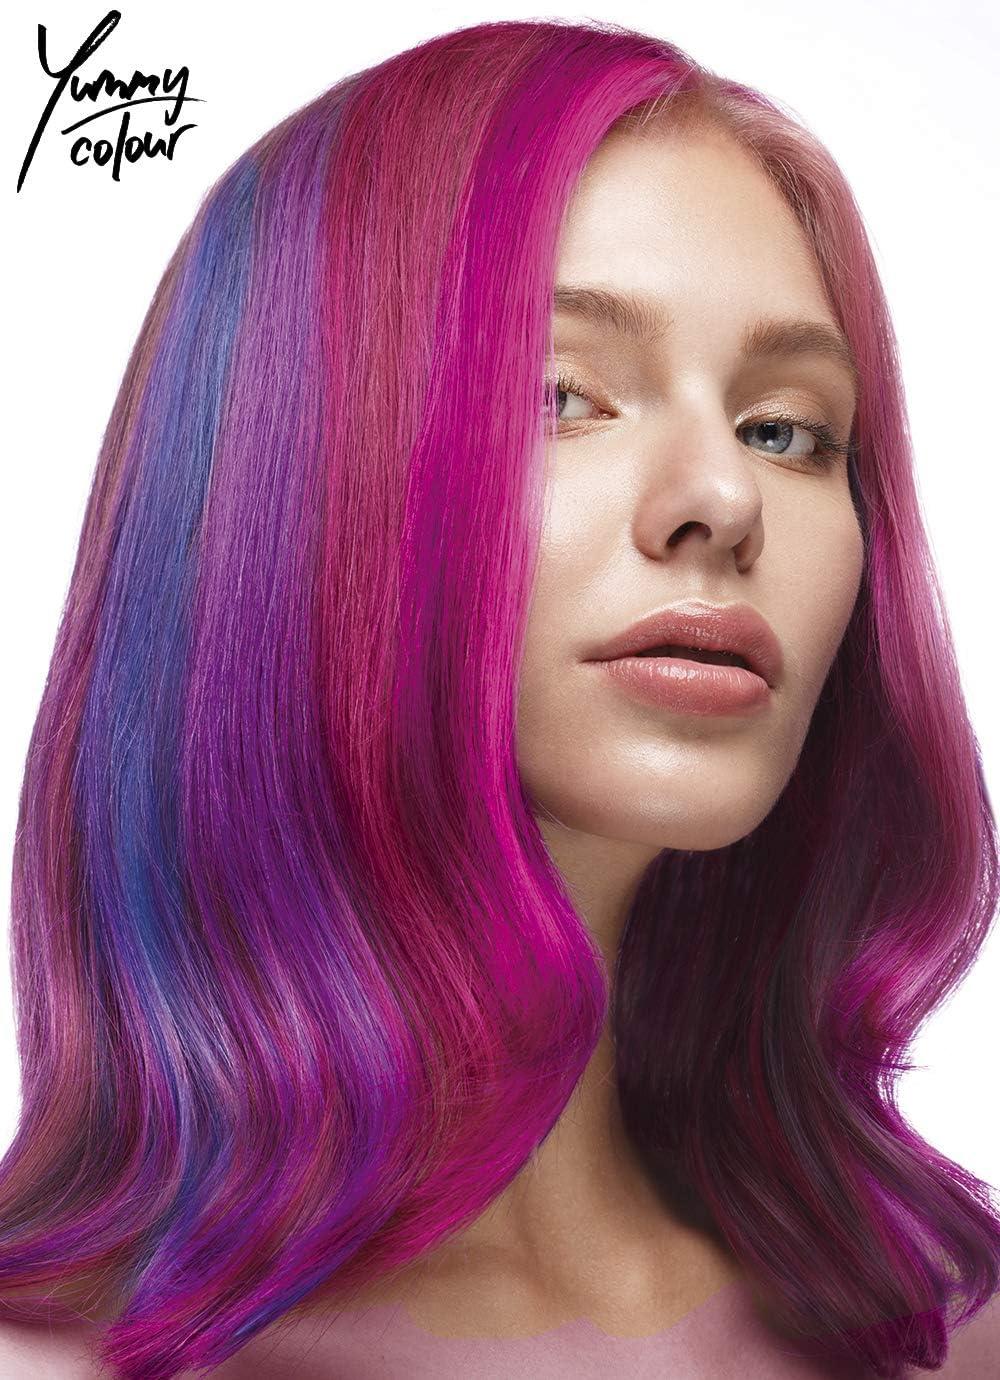 Stargazer Yummy Color 4 Shade Semitransparente Tinte de pelo Tiras Kit